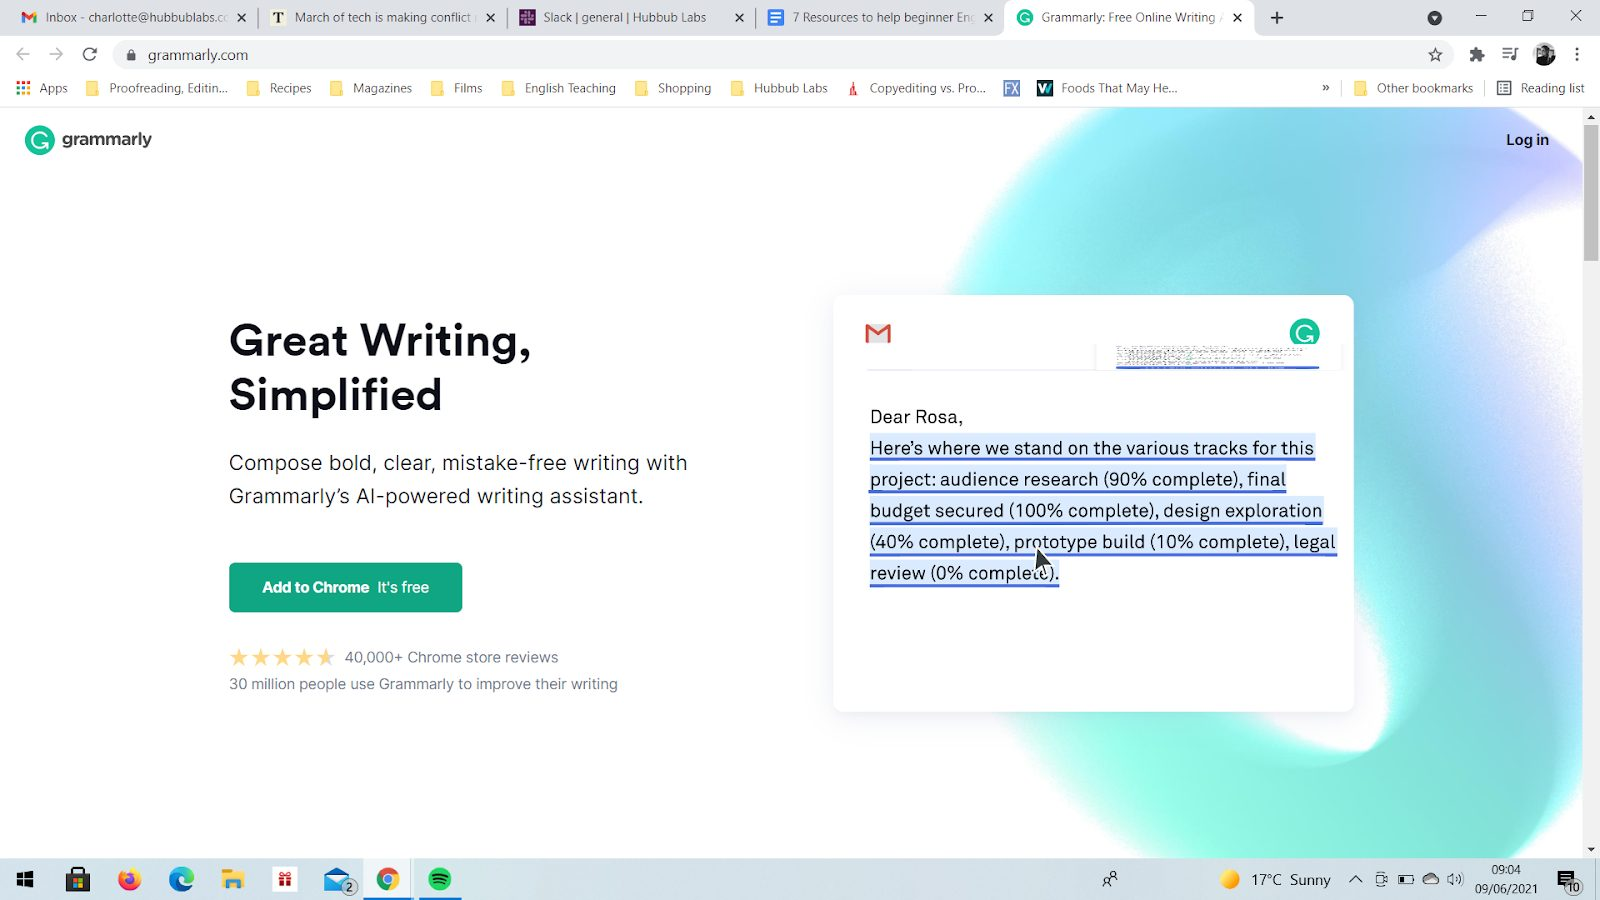 Writing-Grammarly | 8 Recursos para ayudar a los principiantes de inglés | Oxford House Barcelona